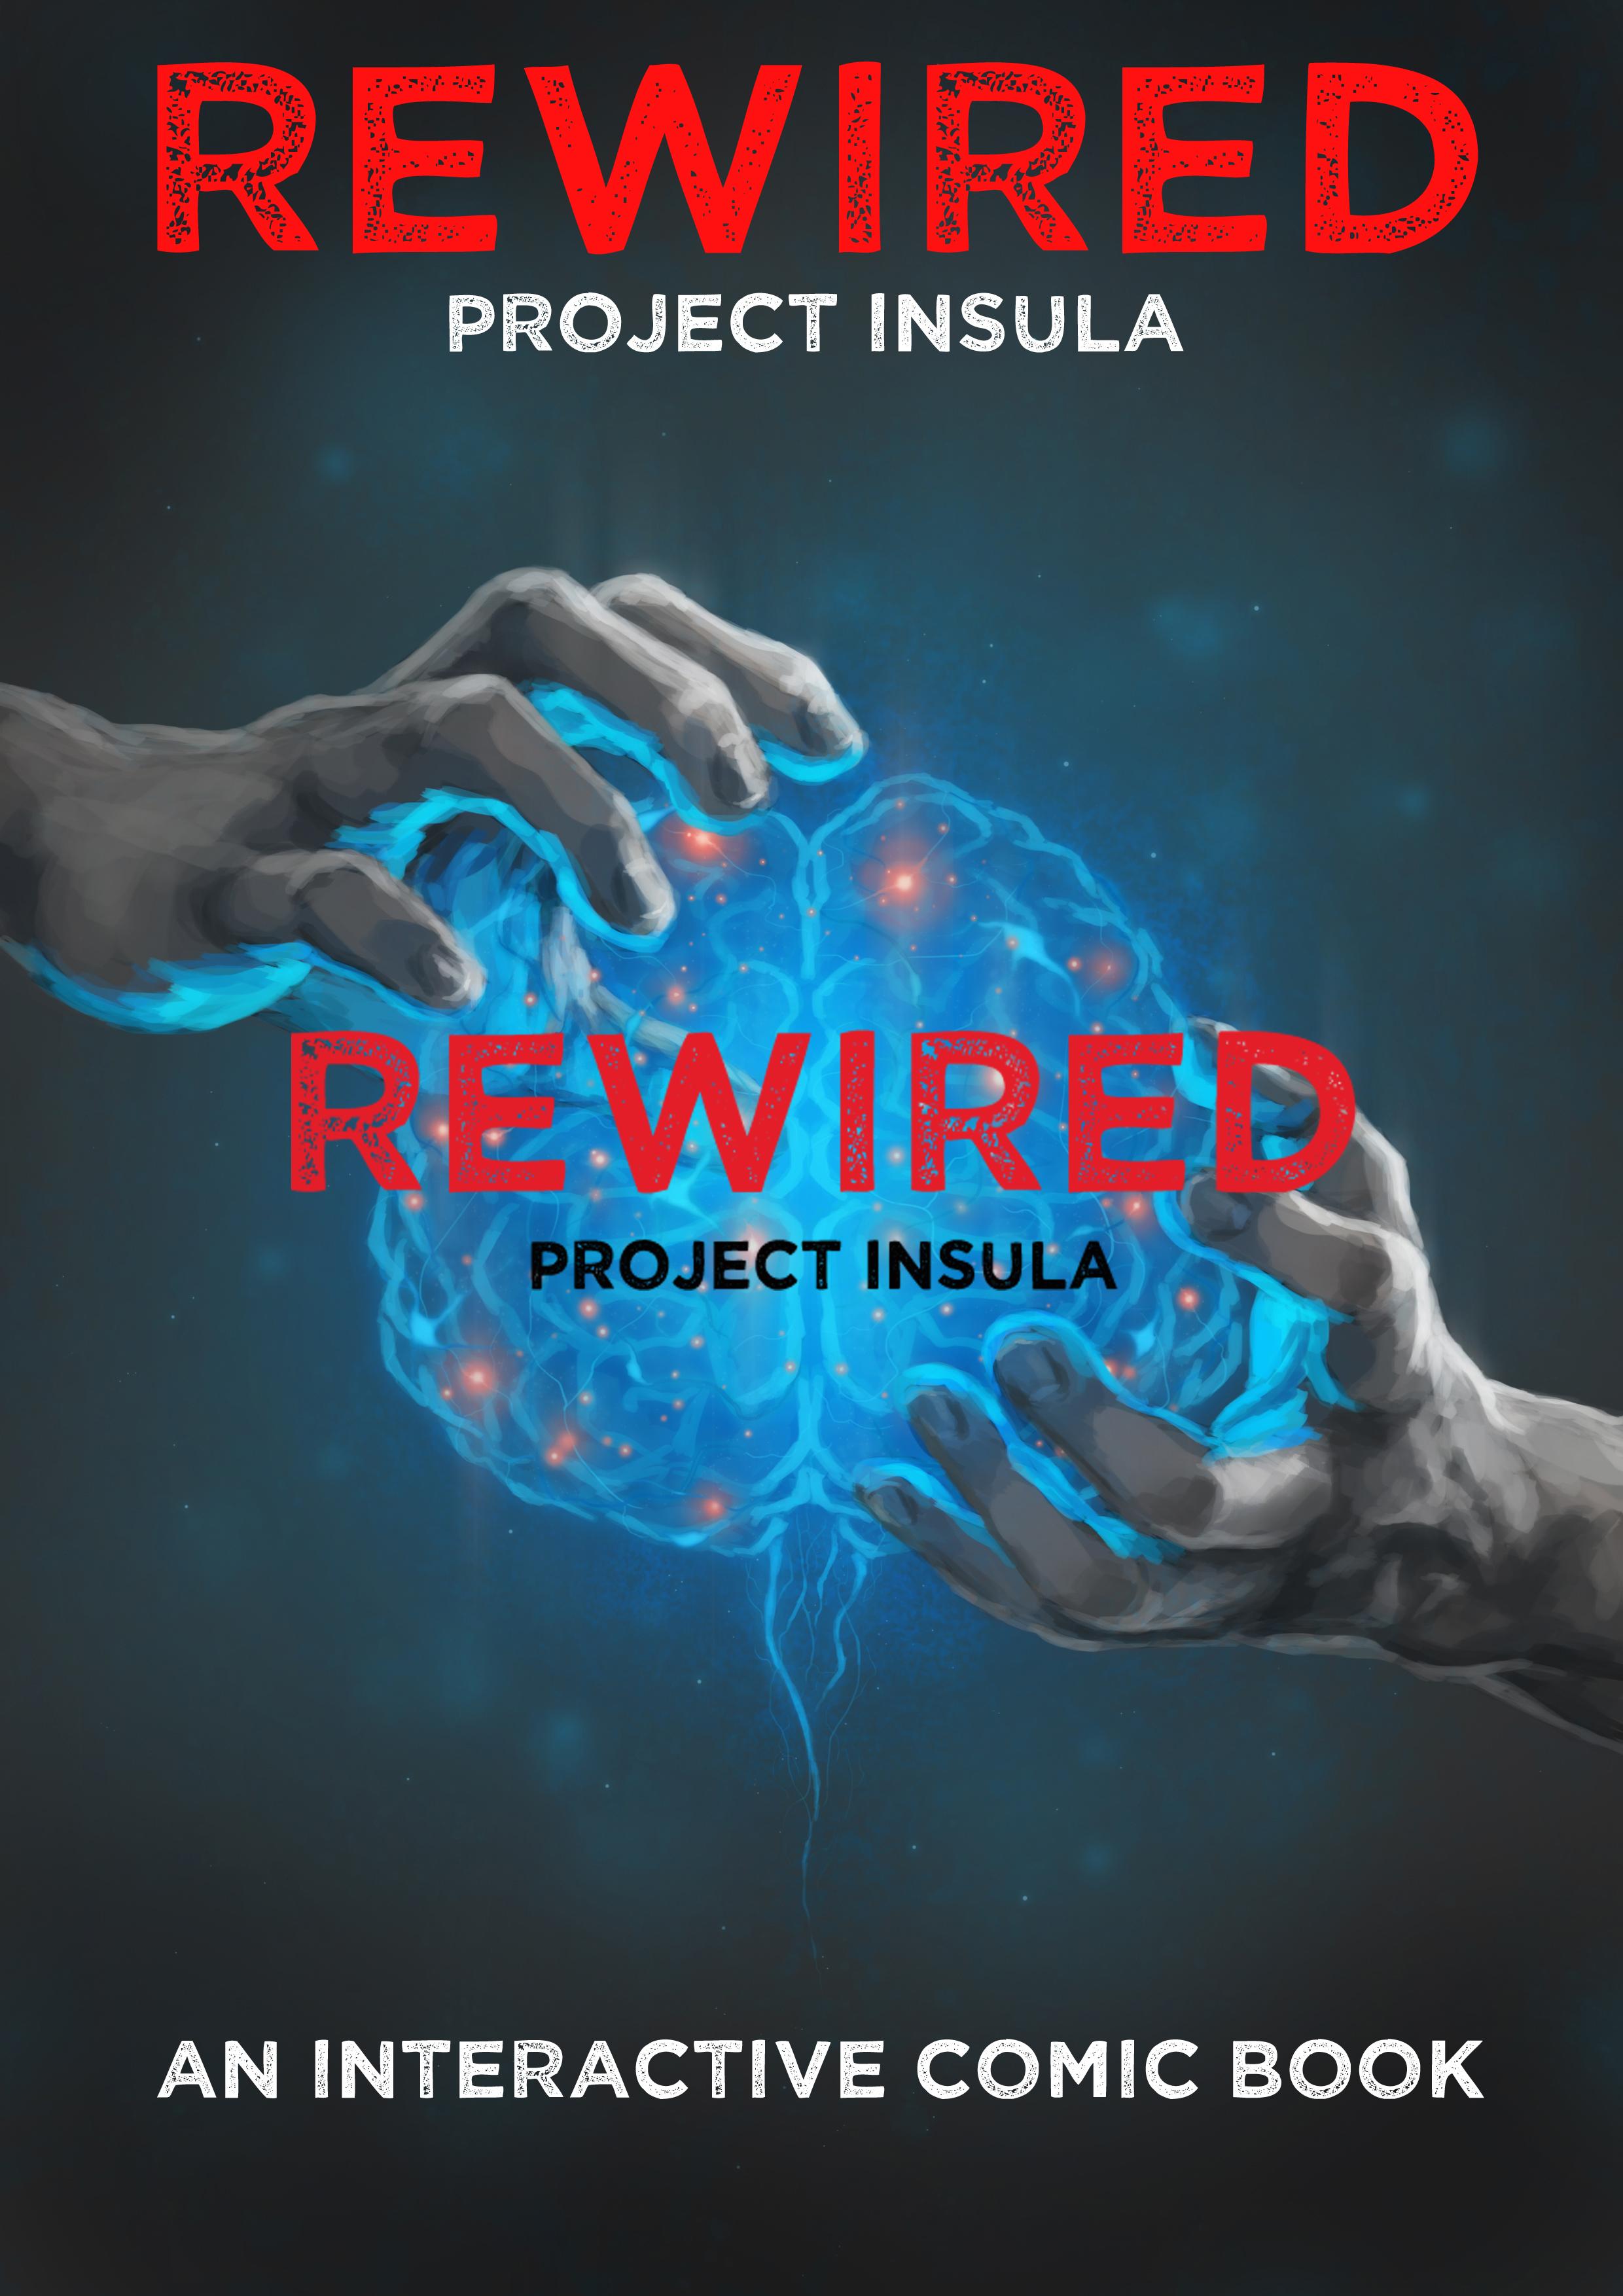 Rewired: Project Insula